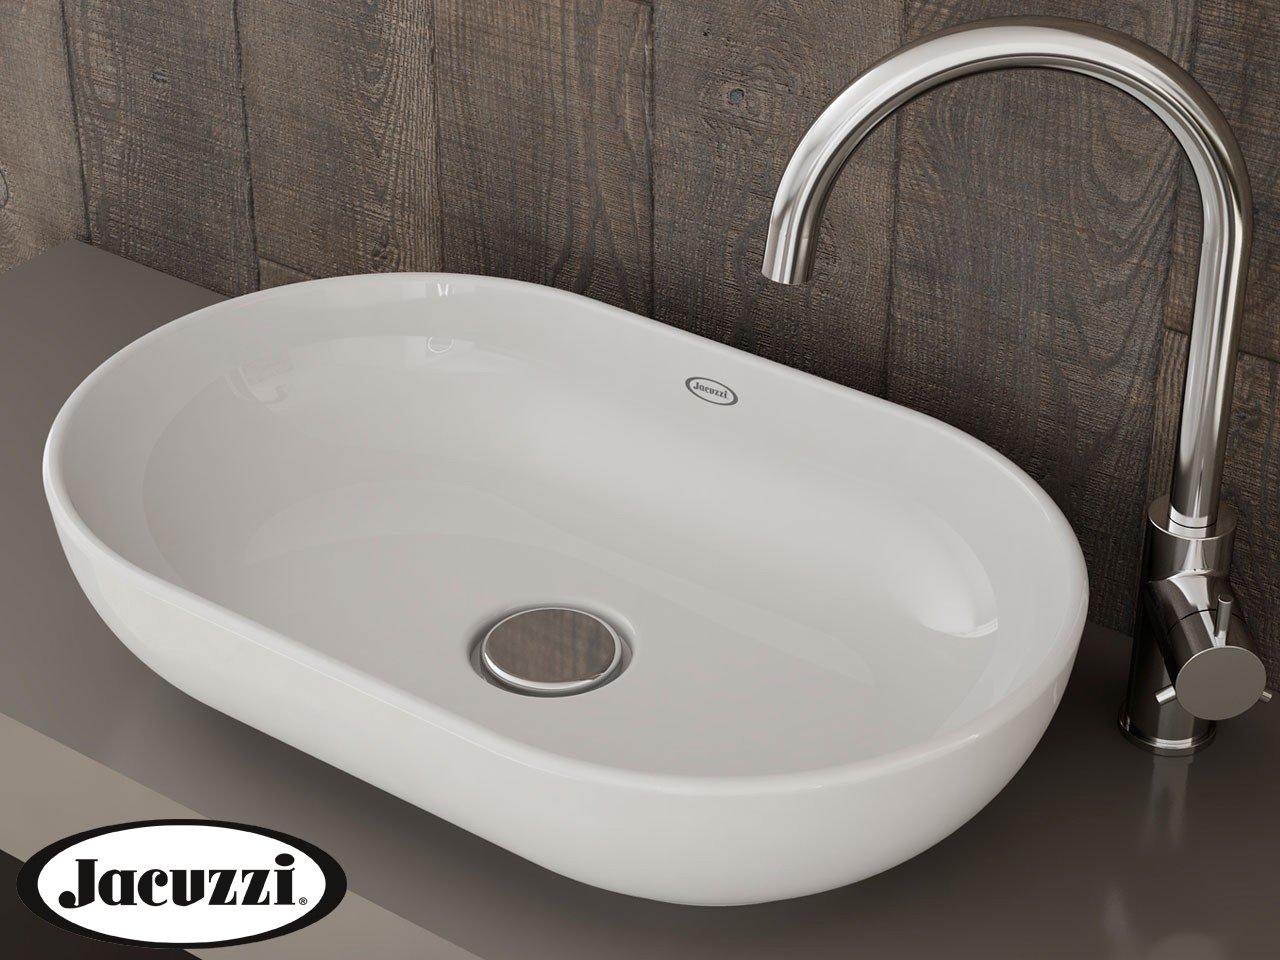 Glow Oval Countertop basin White 55 x 35 x 13